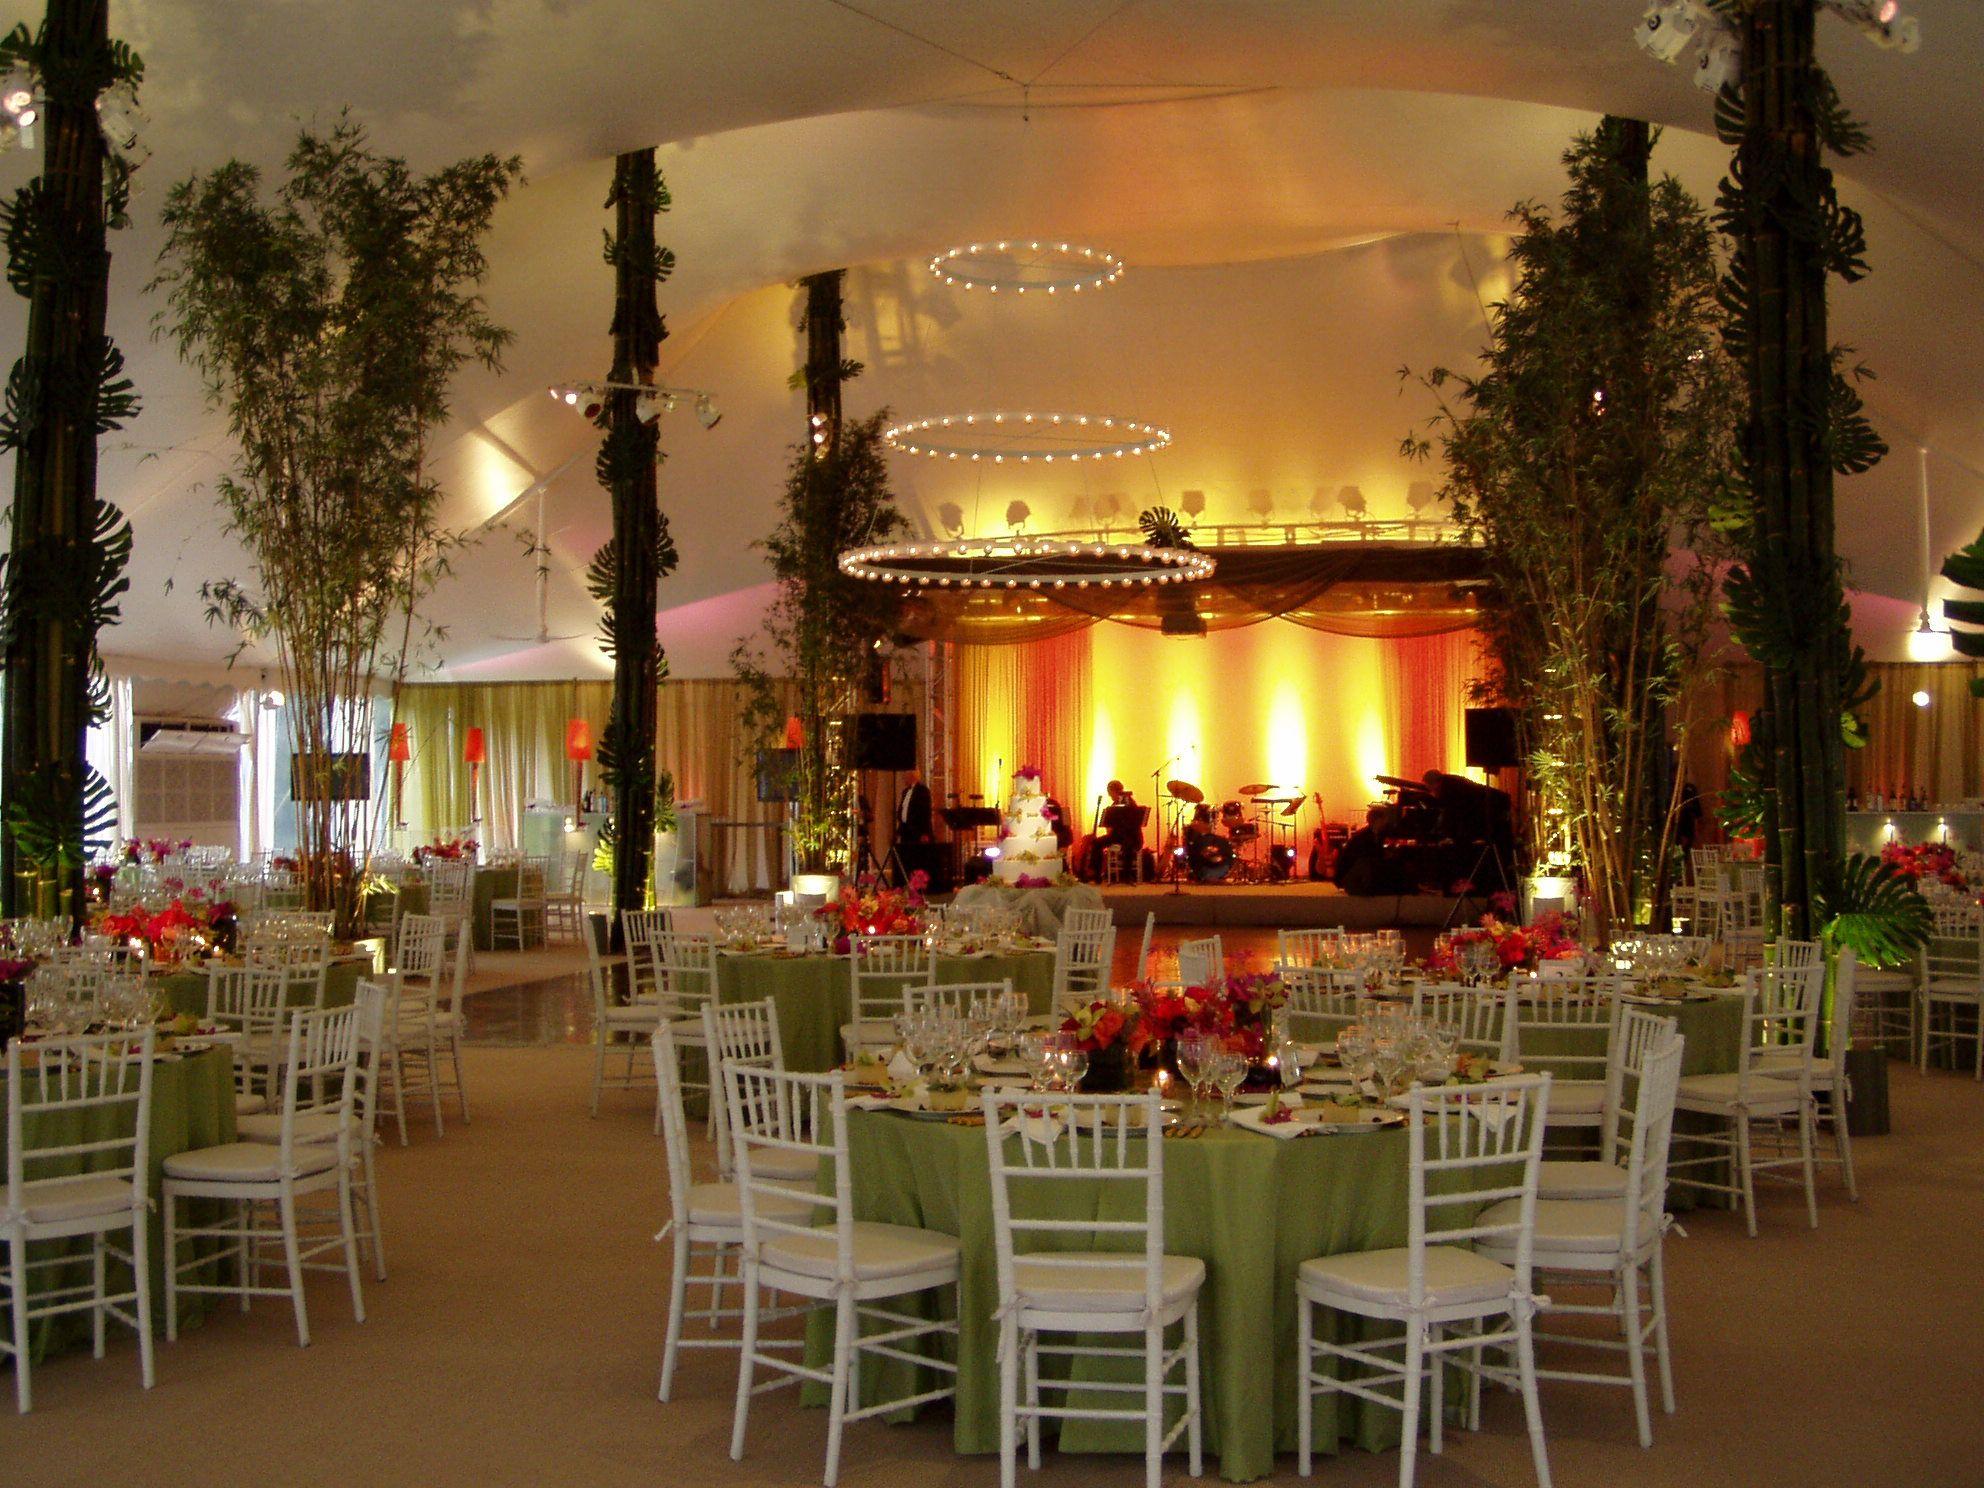 Strong Wedding Tent Interior Tent wedding, Wedding